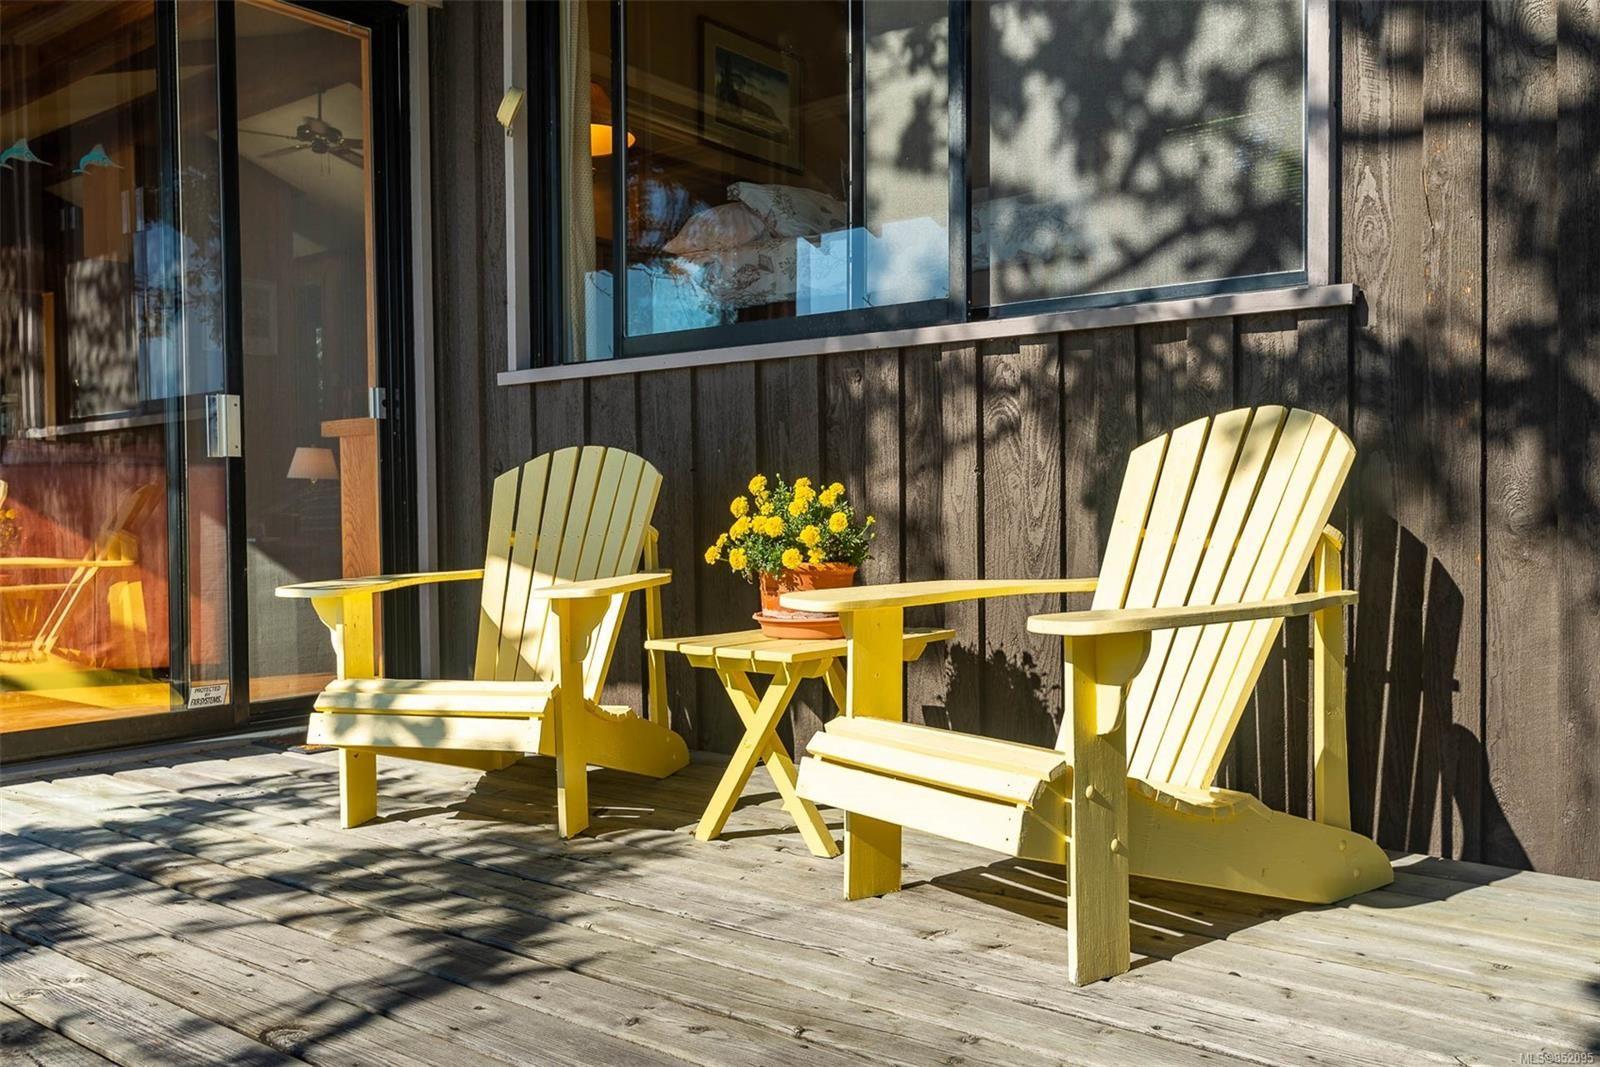 Photo 30: Photos: 236 McGill Rd in : GI Salt Spring House for sale (Gulf Islands)  : MLS®# 852095